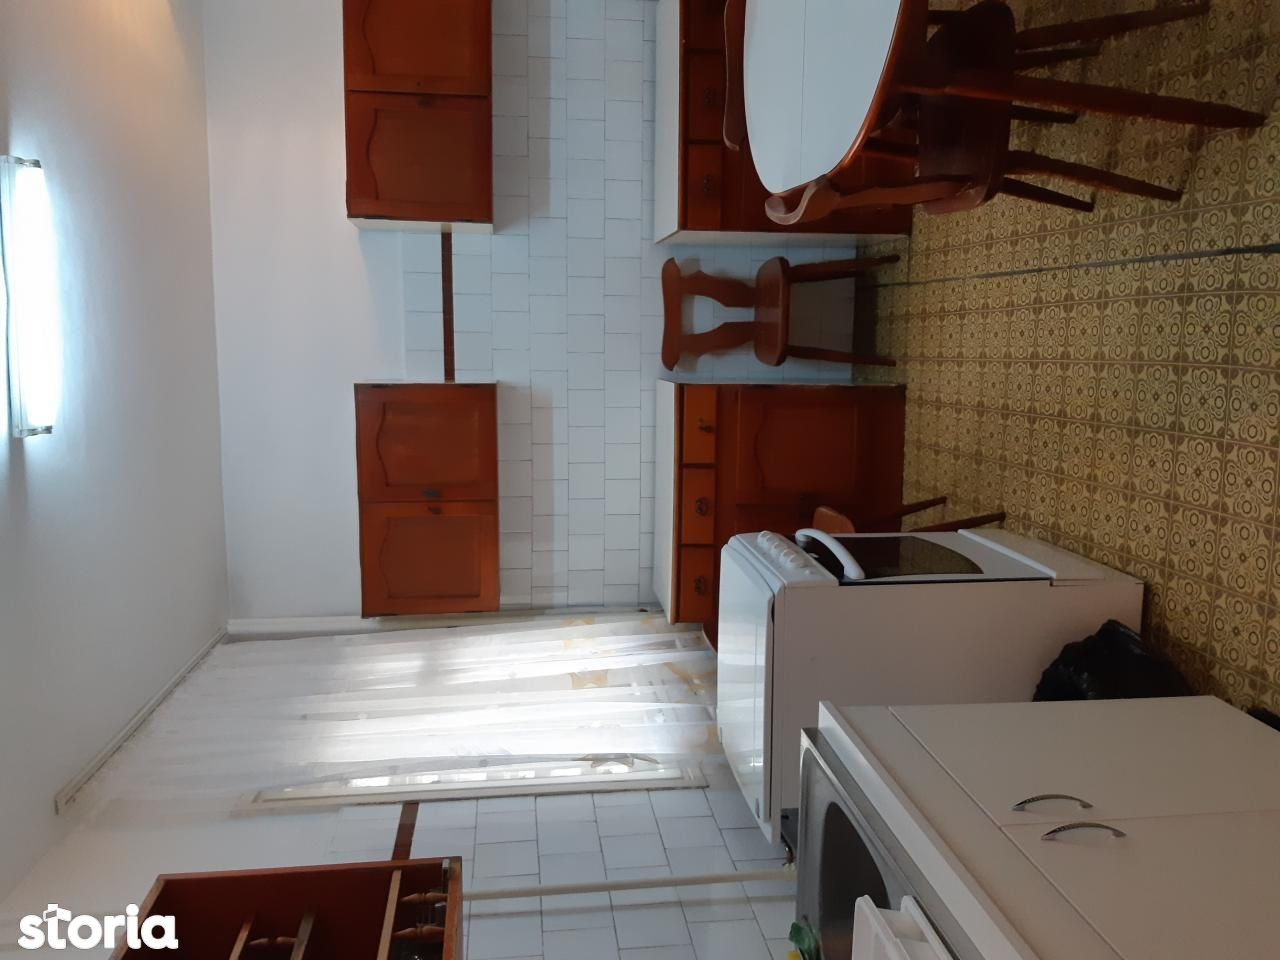 Apartament de inchiriat, București (judet), Obor - Foto 2